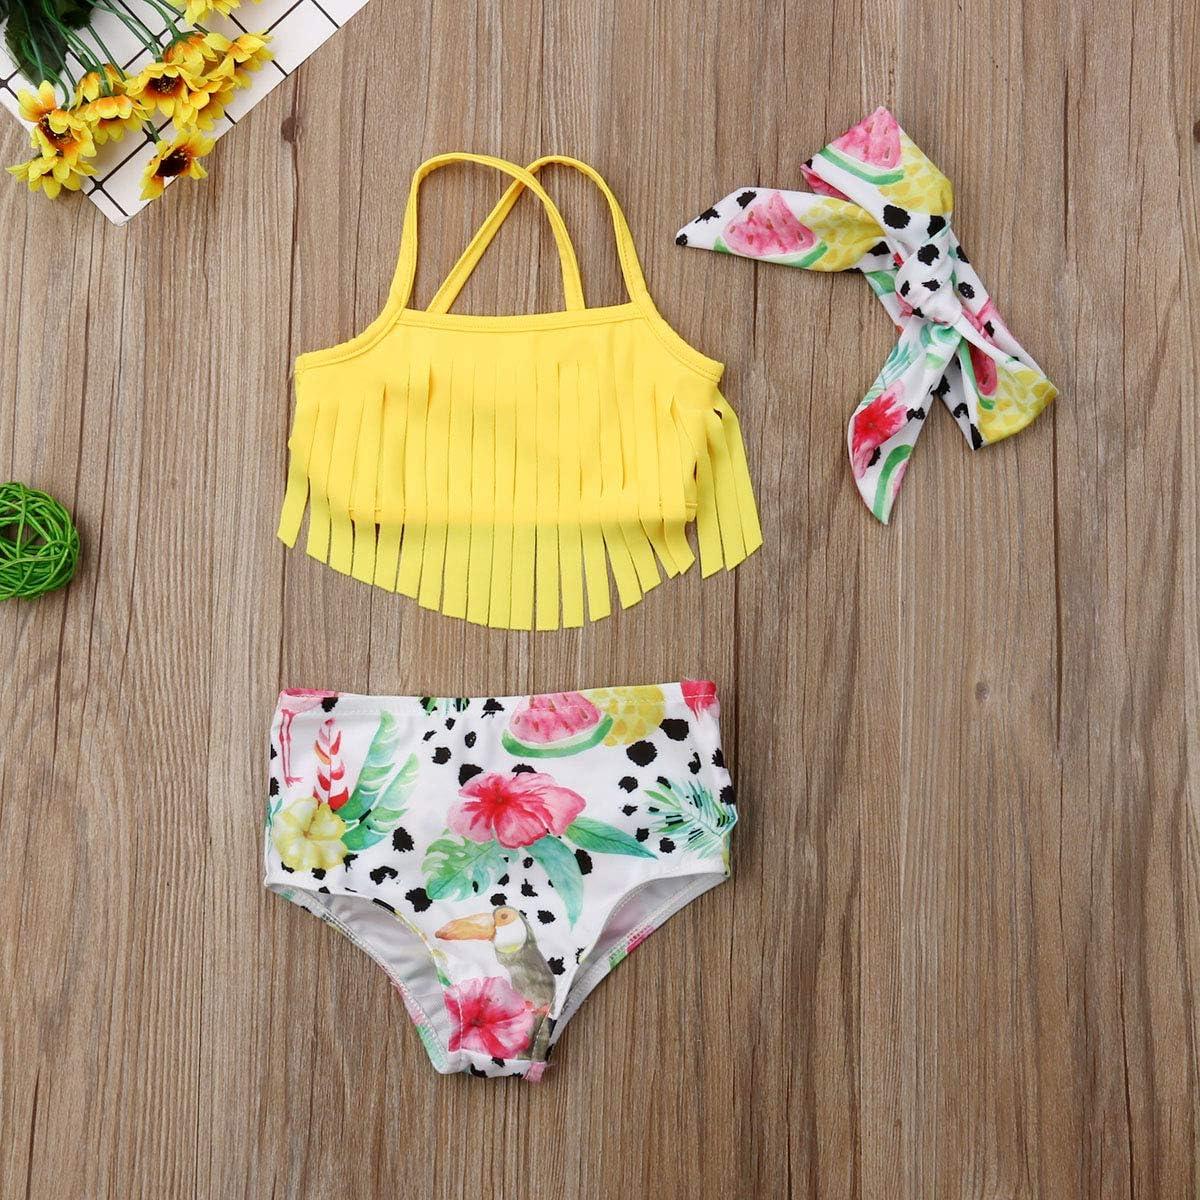 3PCS Newborn Baby Girl Bikini Set Tassel Sling Crop Top Watermelon Print Shorts+Headband/Swimsuit Bathing Suit